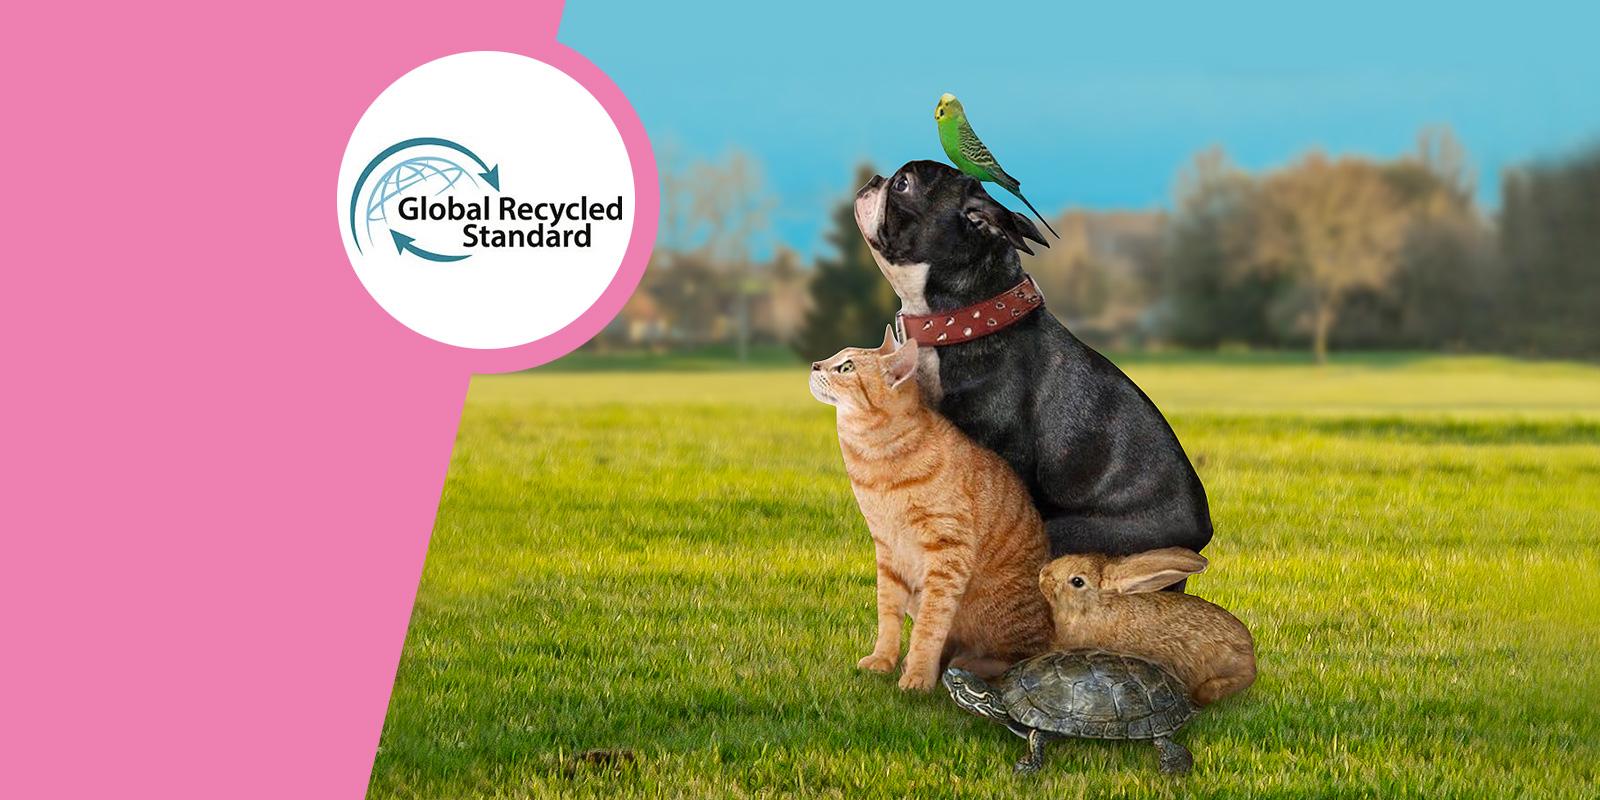 global-recycled shop abbigliamento e cosmesi